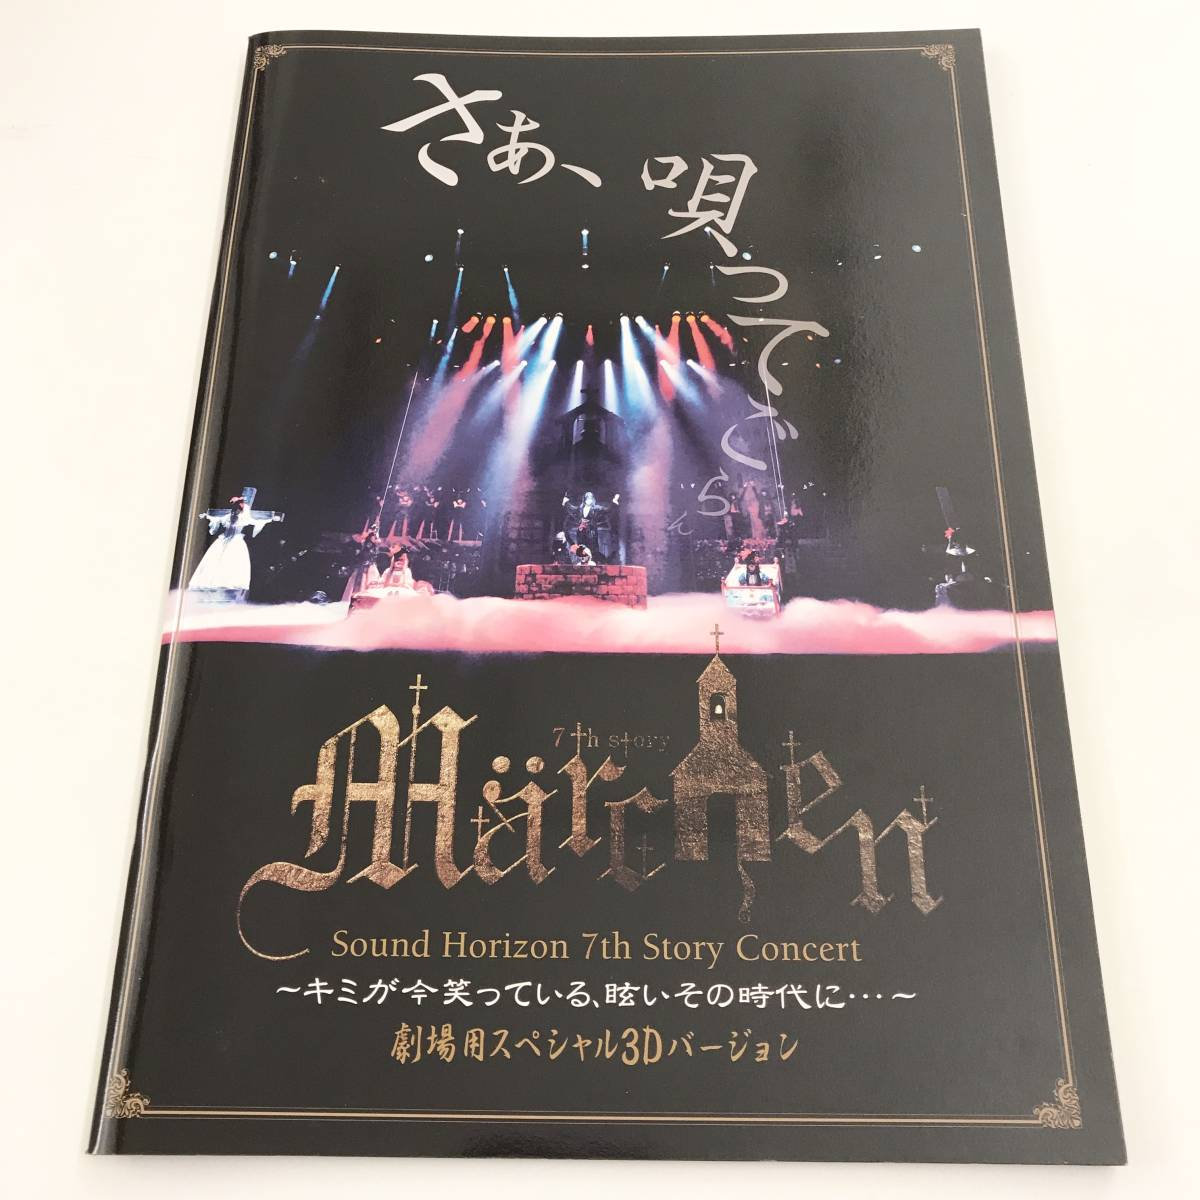 Sound Horizon 7th Story Concert Marchen 劇場用スペシャル3Dバージョン パンフレット